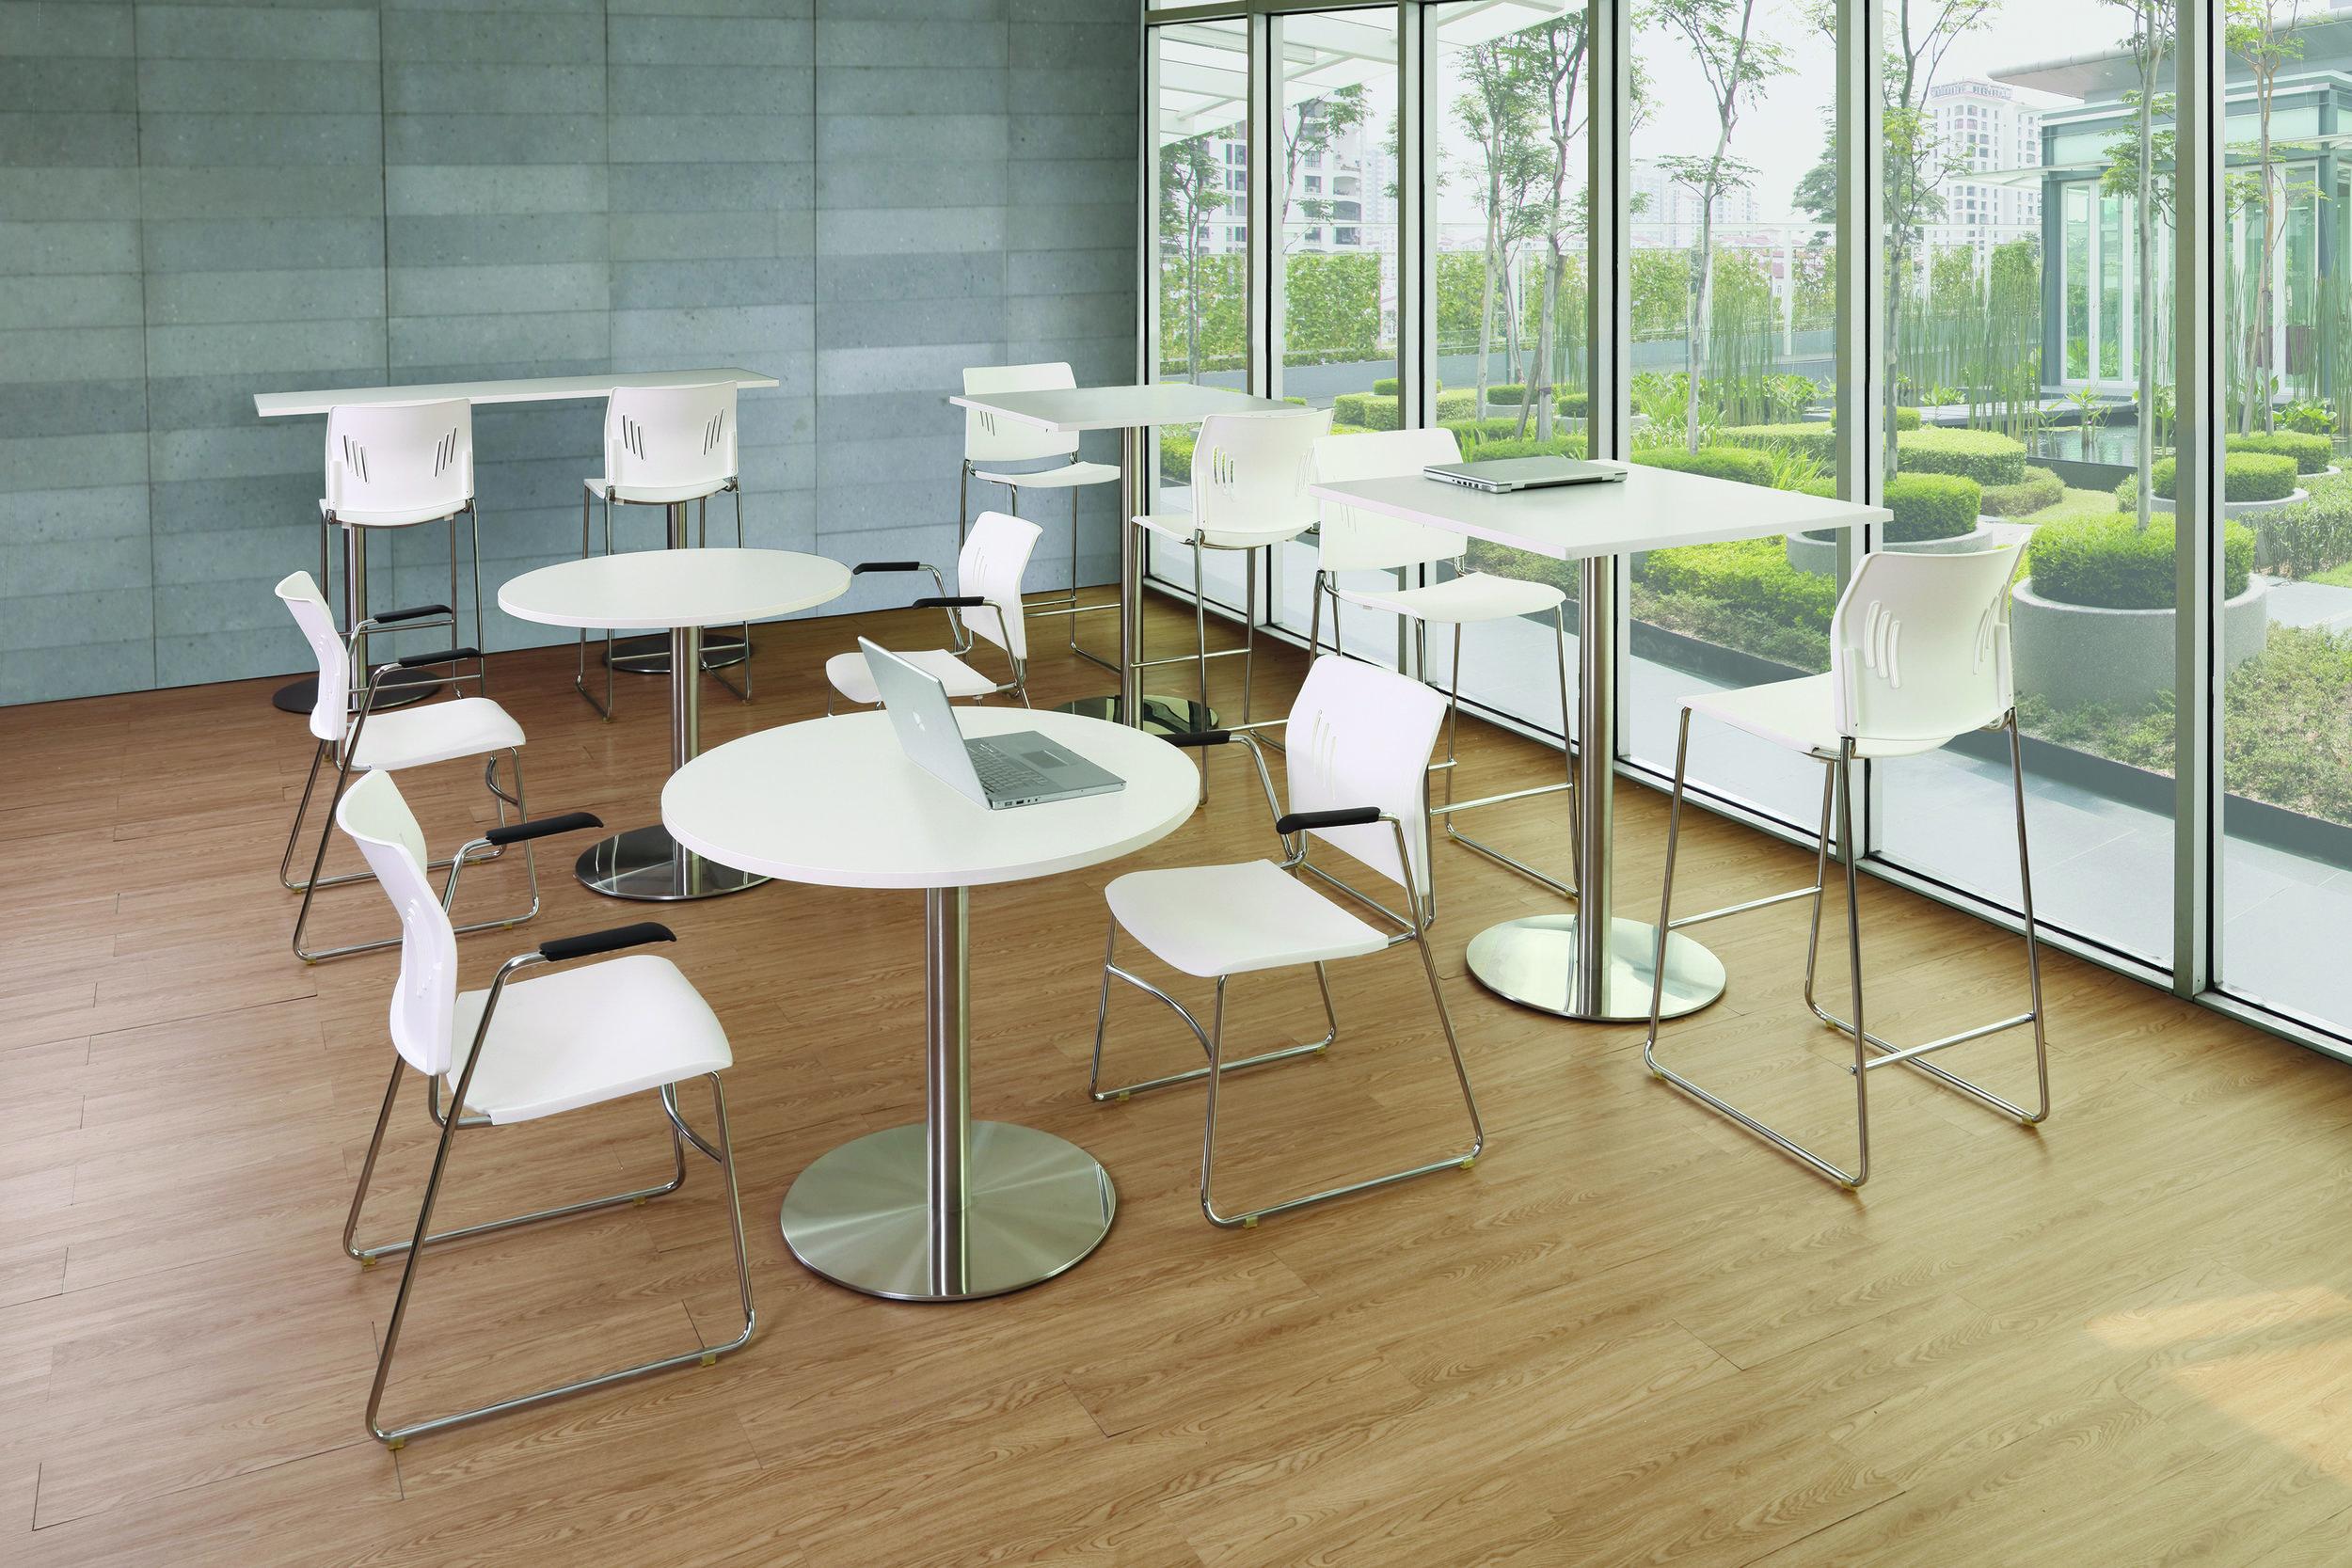 PER-BLEECKER-ENVIRONMENT-10 offered by Indoff Office Interiors.jpg